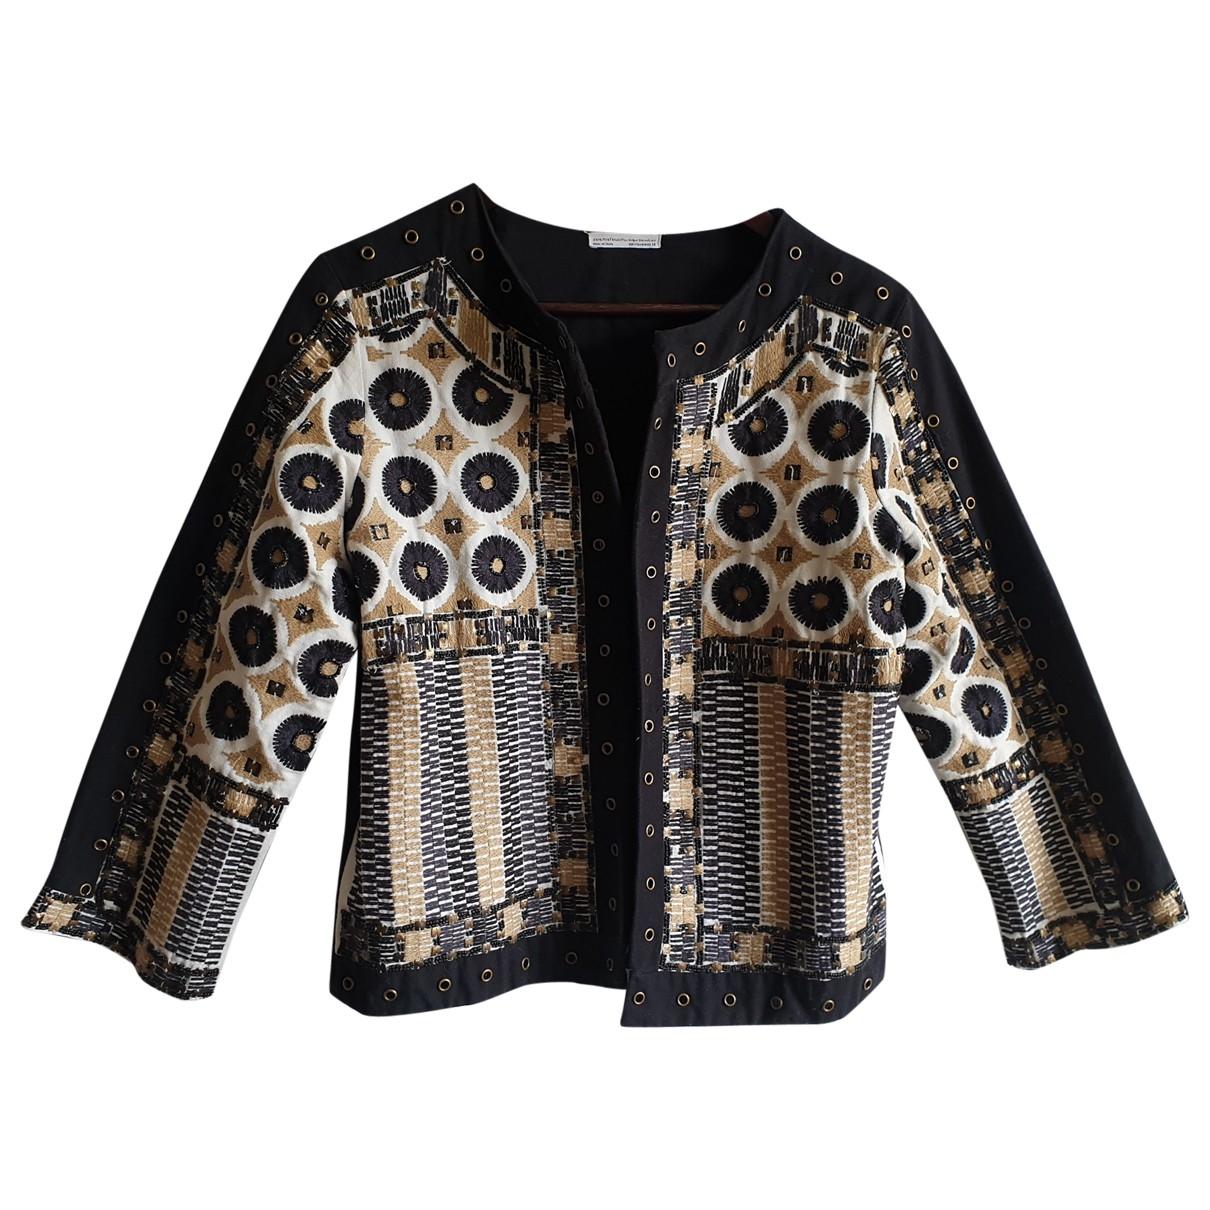 Zara \N Black Cotton jacket for Women M International